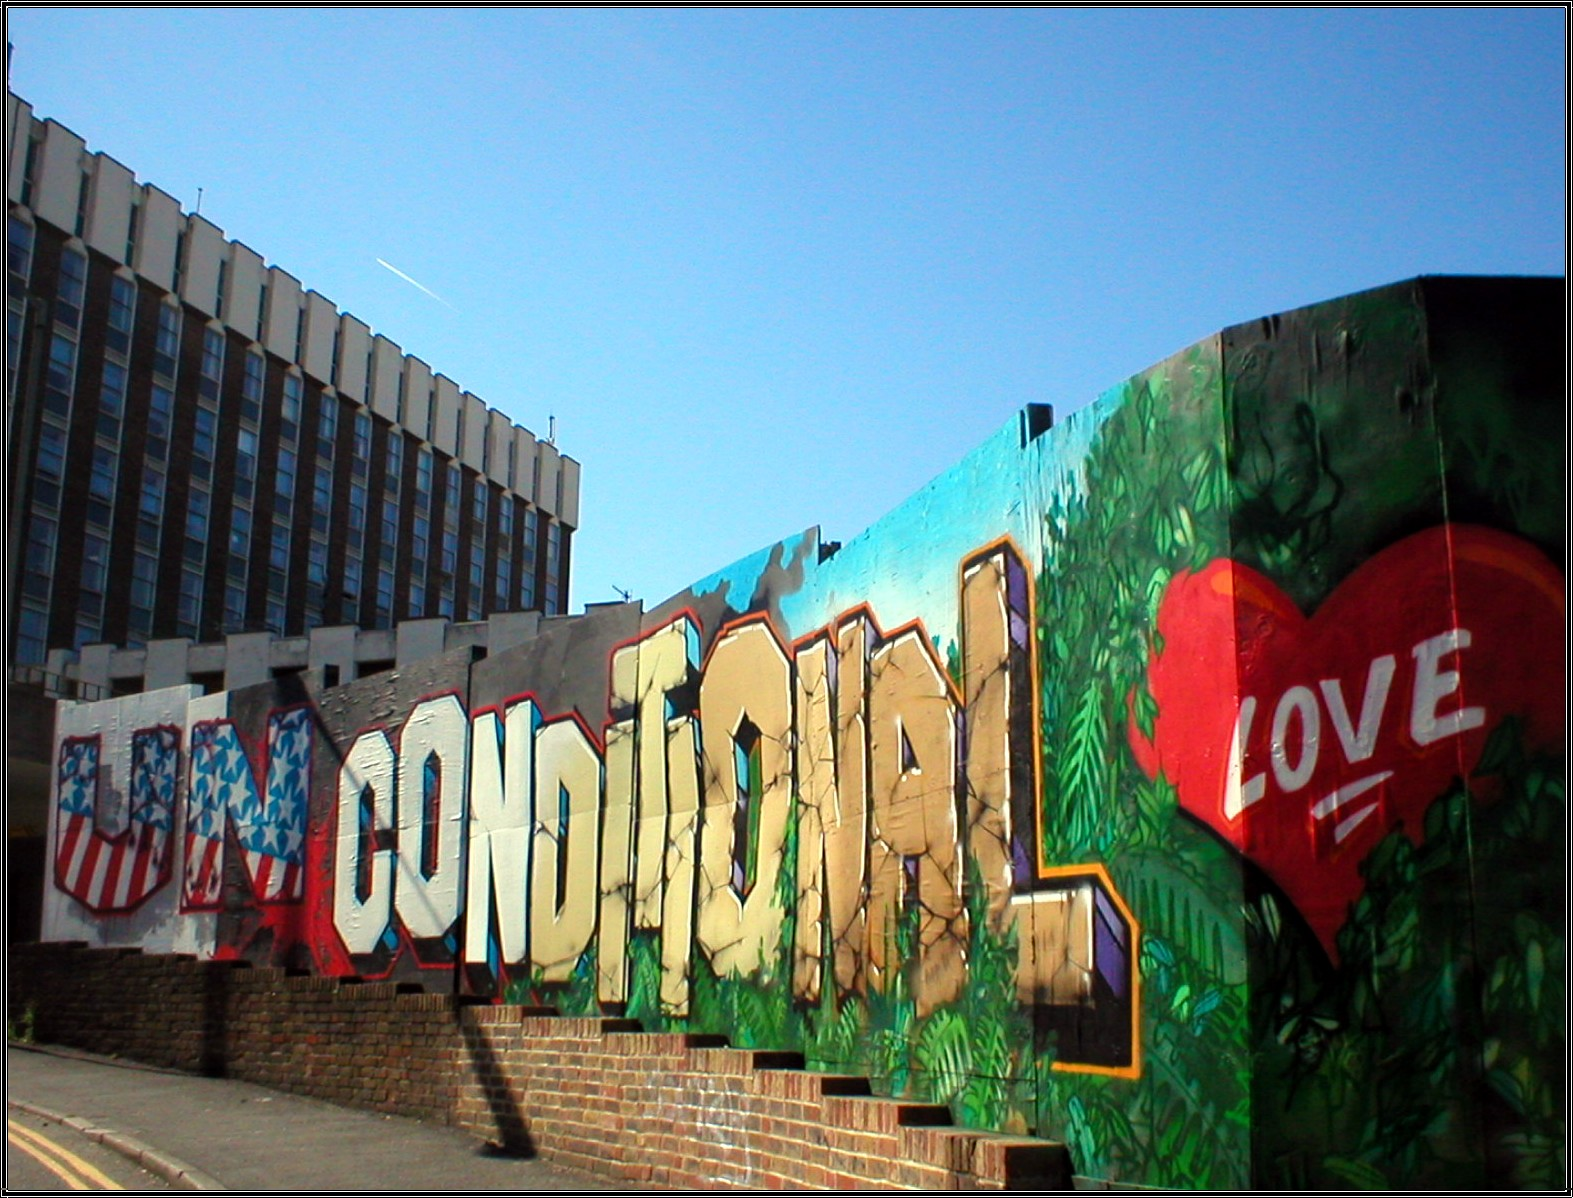 http://4.bp.blogspot.com/-Qu18Nu3lvbM/TwCKkljyIKI/AAAAAAAAAkE/u6jnXNsJ67U/s1600/unconditional-love.jpg